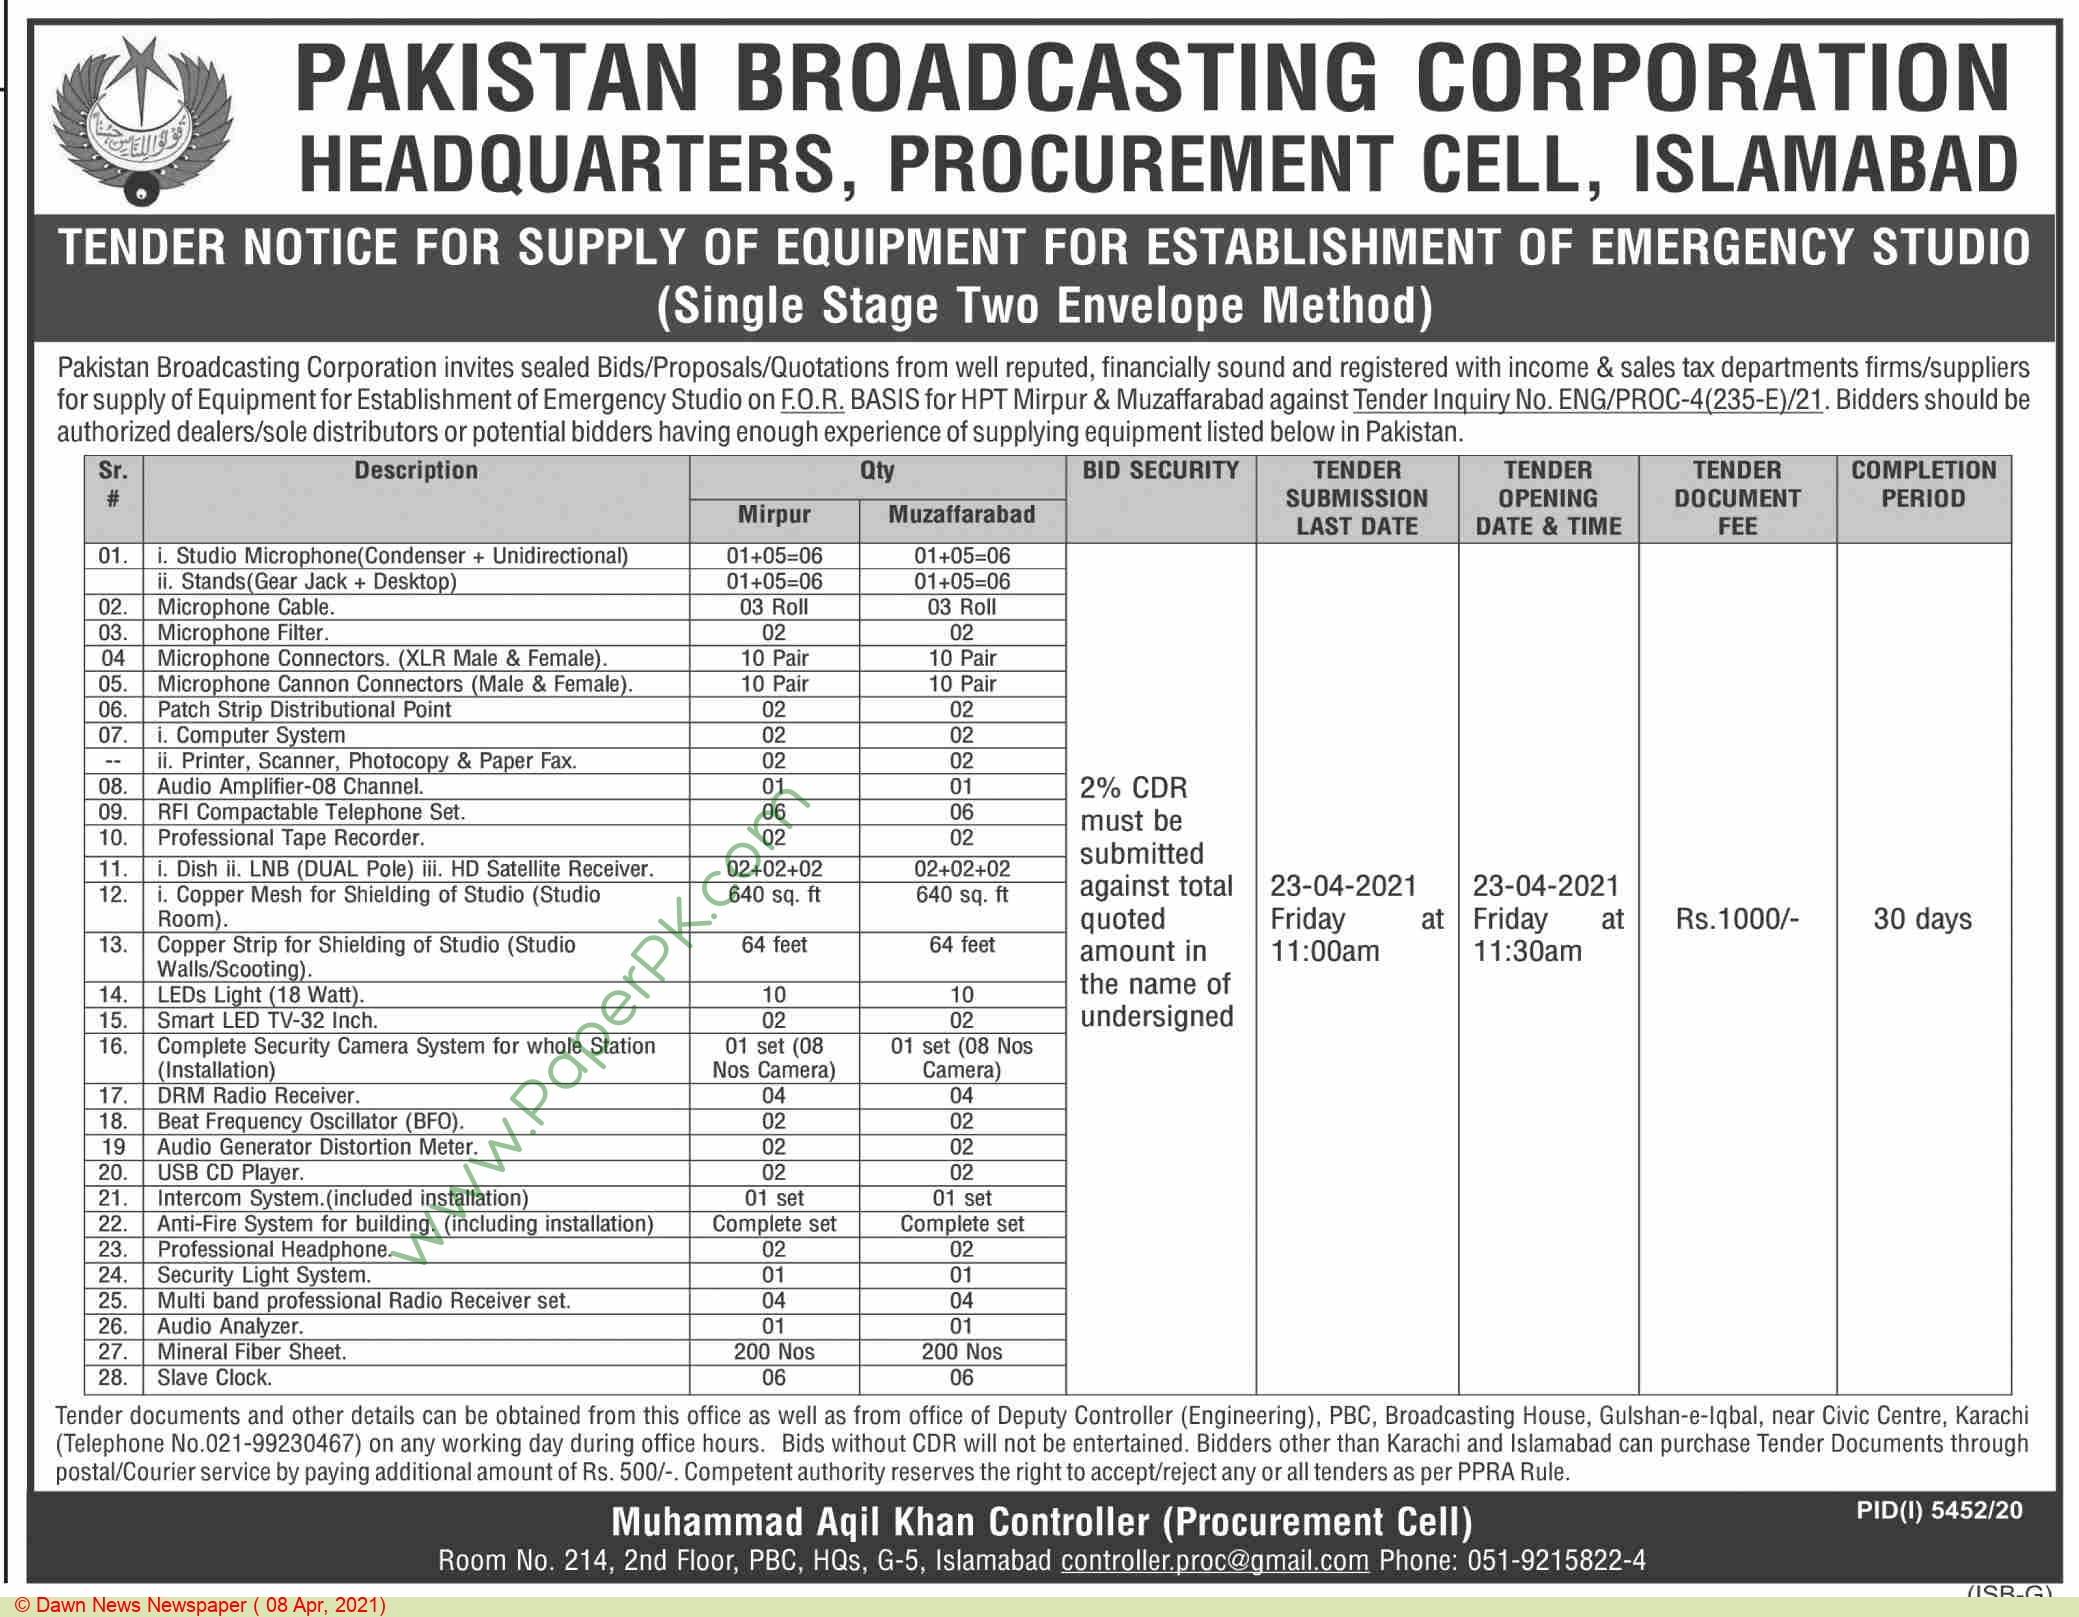 Pakistan Broadcasting Corporation Islamabad Tender Notice